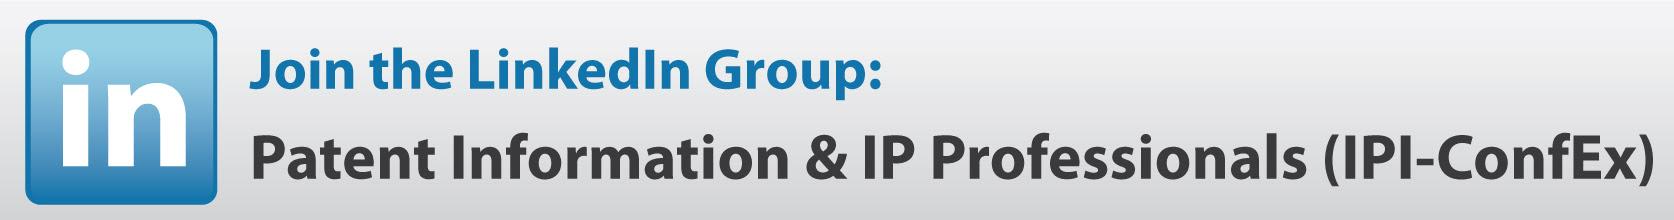 LinkedIn-IPIConfEx-Group-lgj